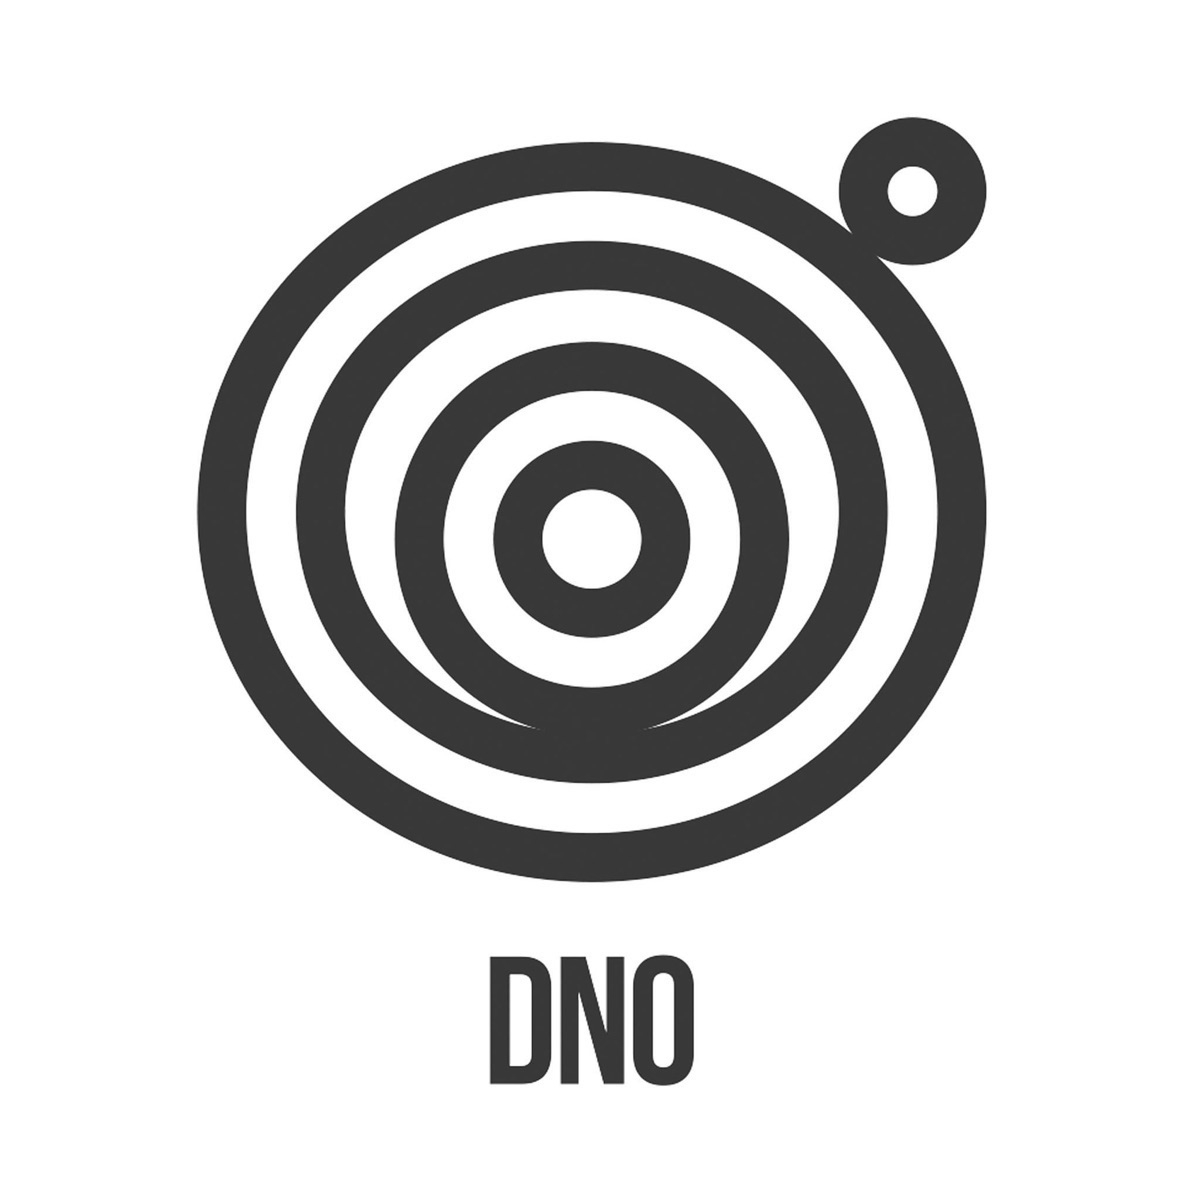 DNO /dnɒ/ hard information lock - dnorecords | ello